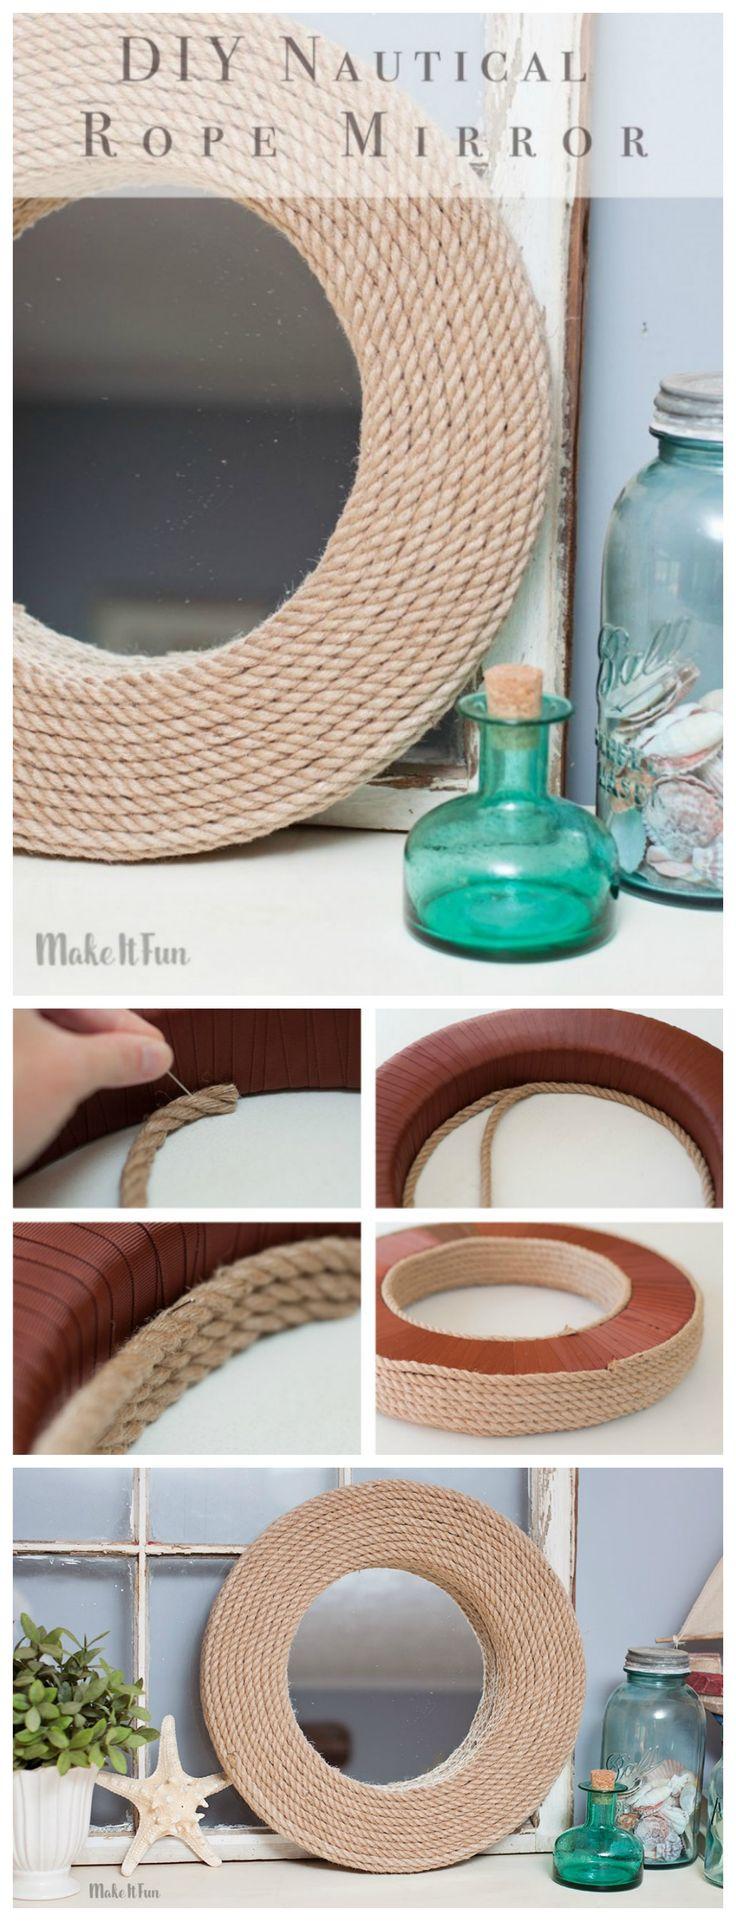 Create a DIY custom mirror for the house with a Nautical decor twist.